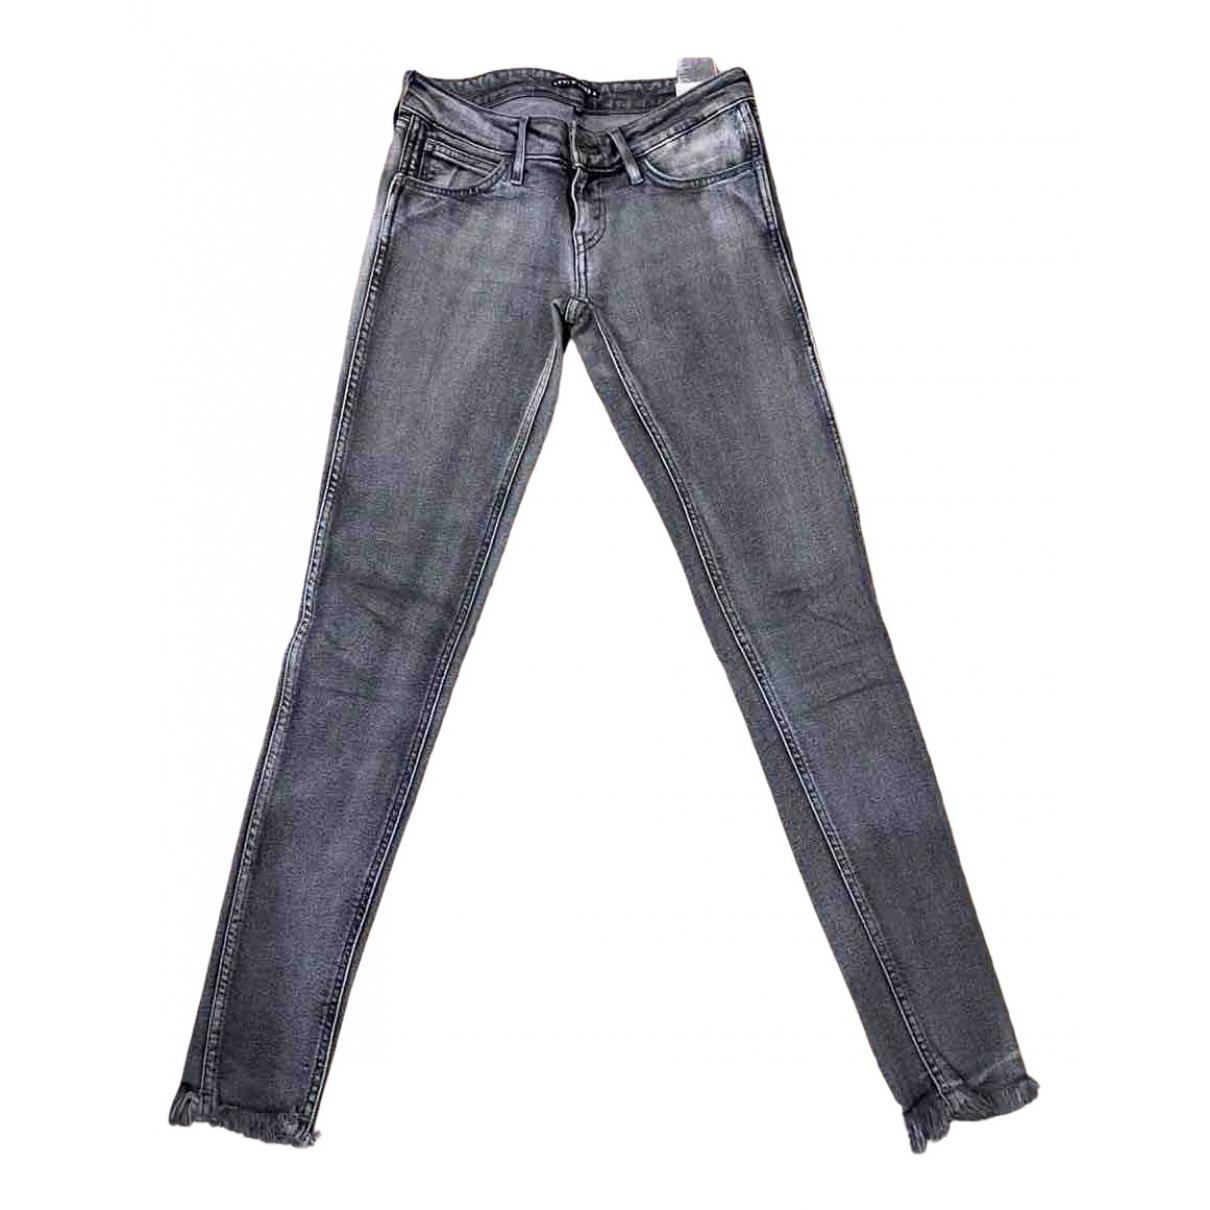 Levi's N Grey Denim - Jeans Jeans for Women 25 US